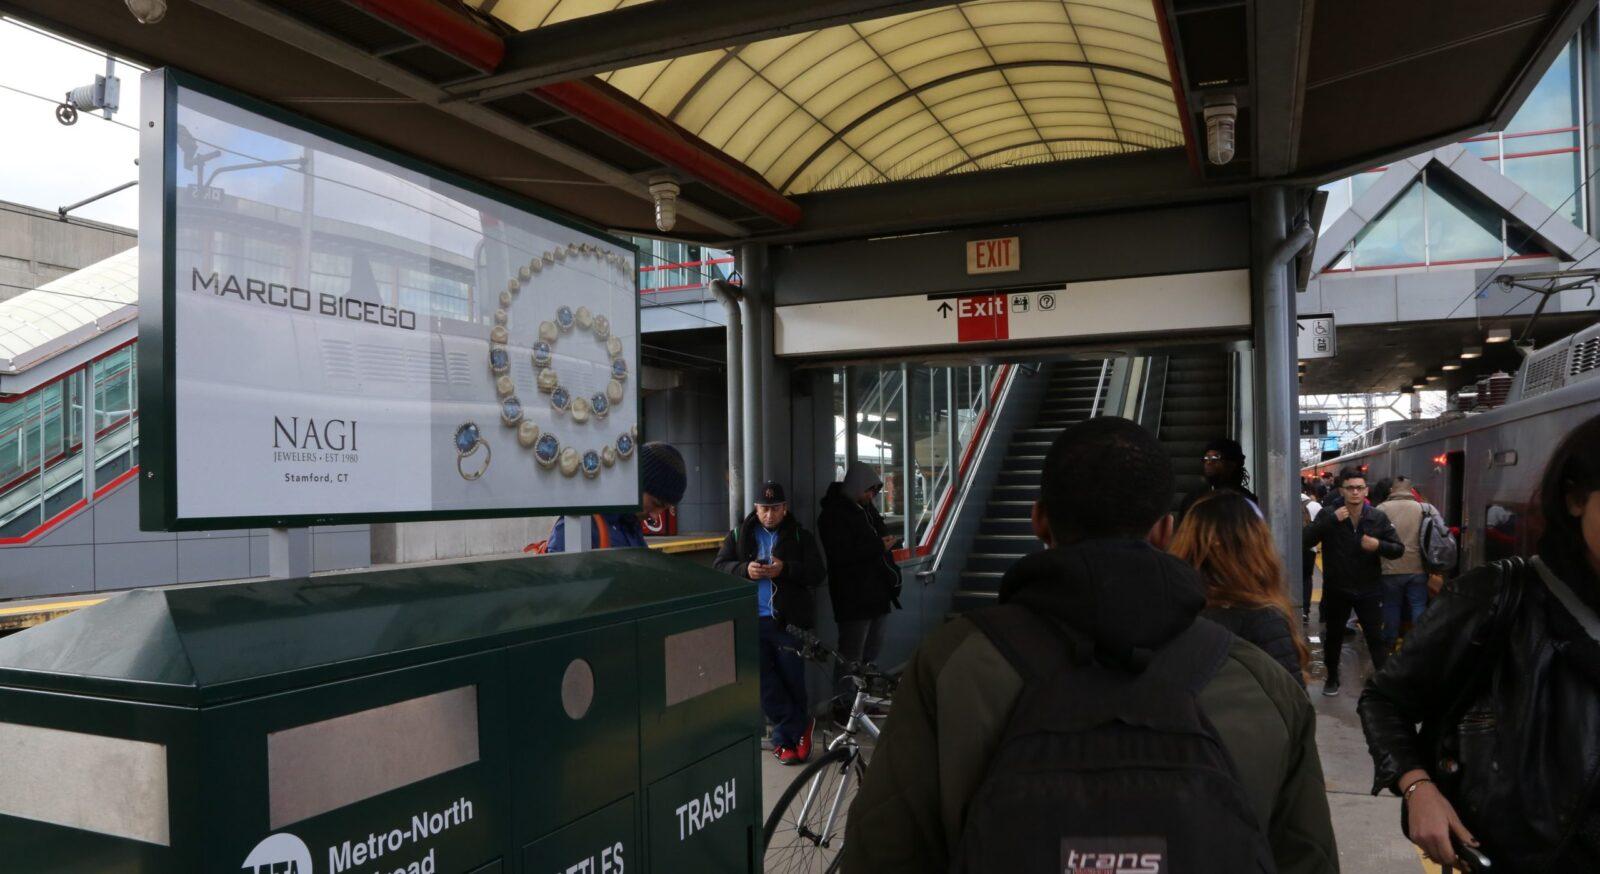 NAGI Jewelers Rail Platform Advertising